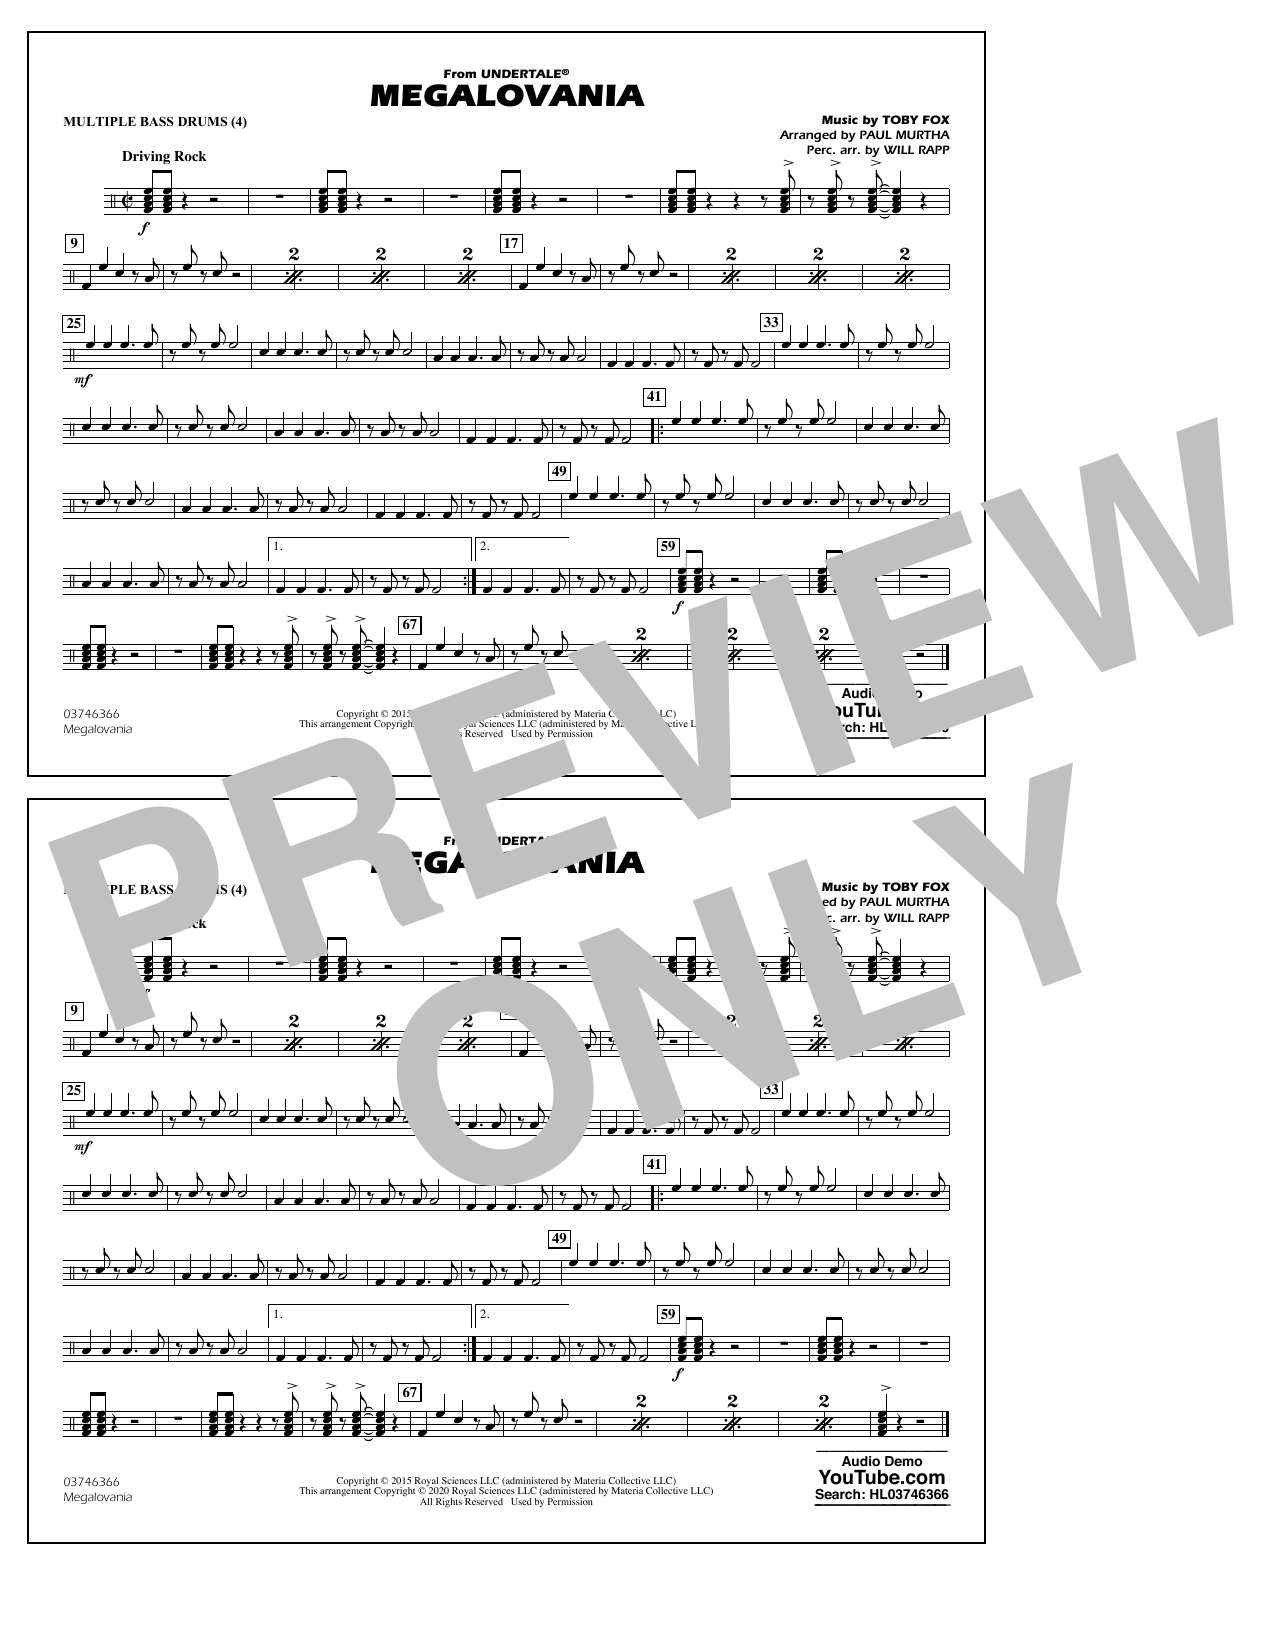 Megalovania (from Undertale) (arr. Paul Murtha) - Multiple Bass Drums Sheet Music